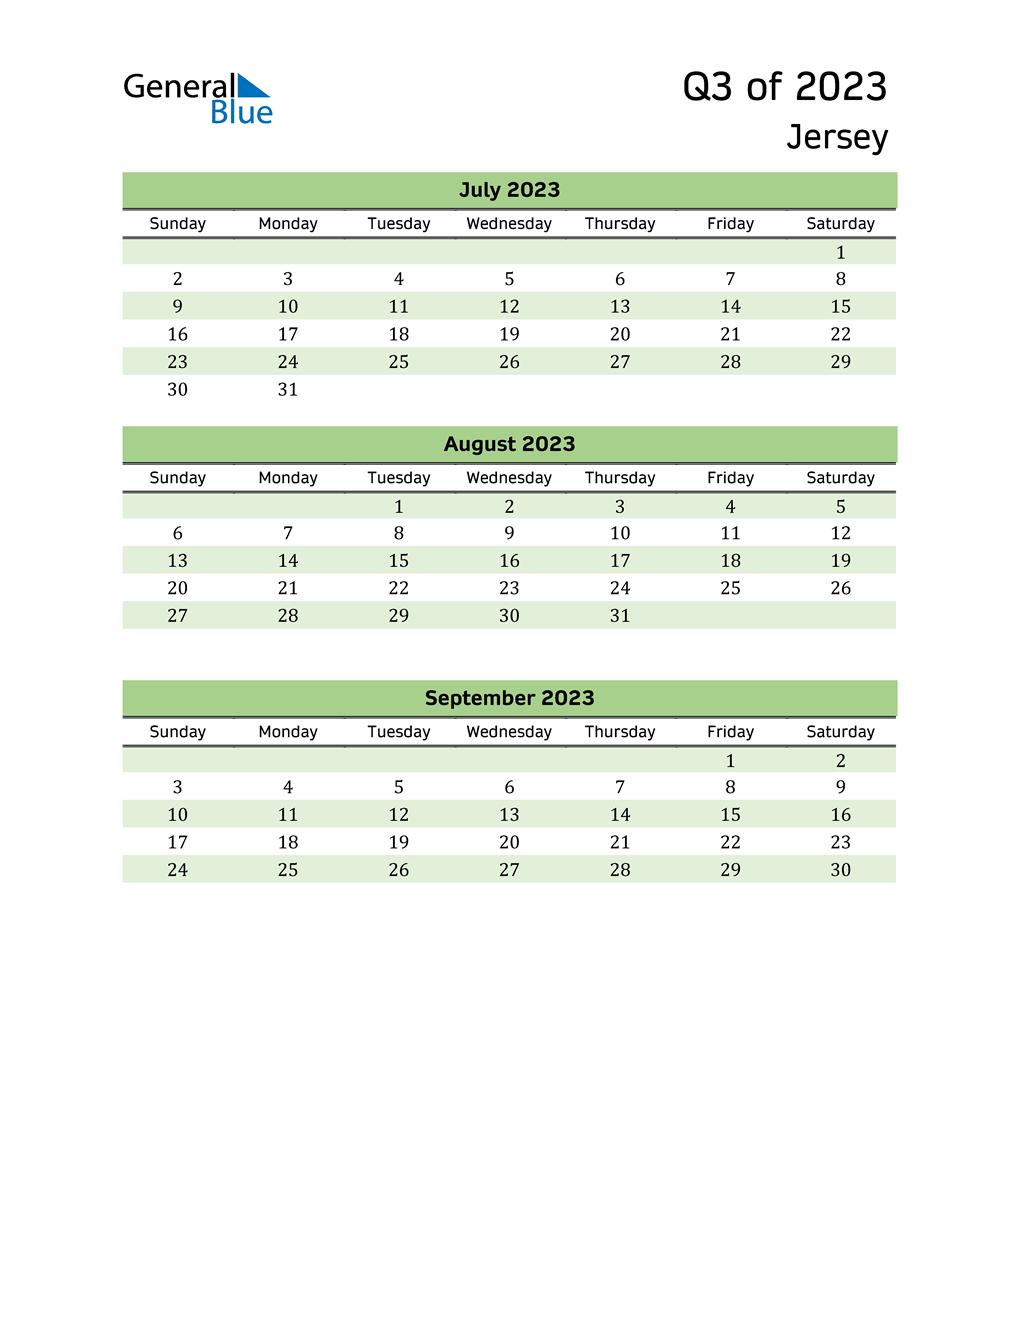 Quarterly Calendar 2023 with Jersey Holidays